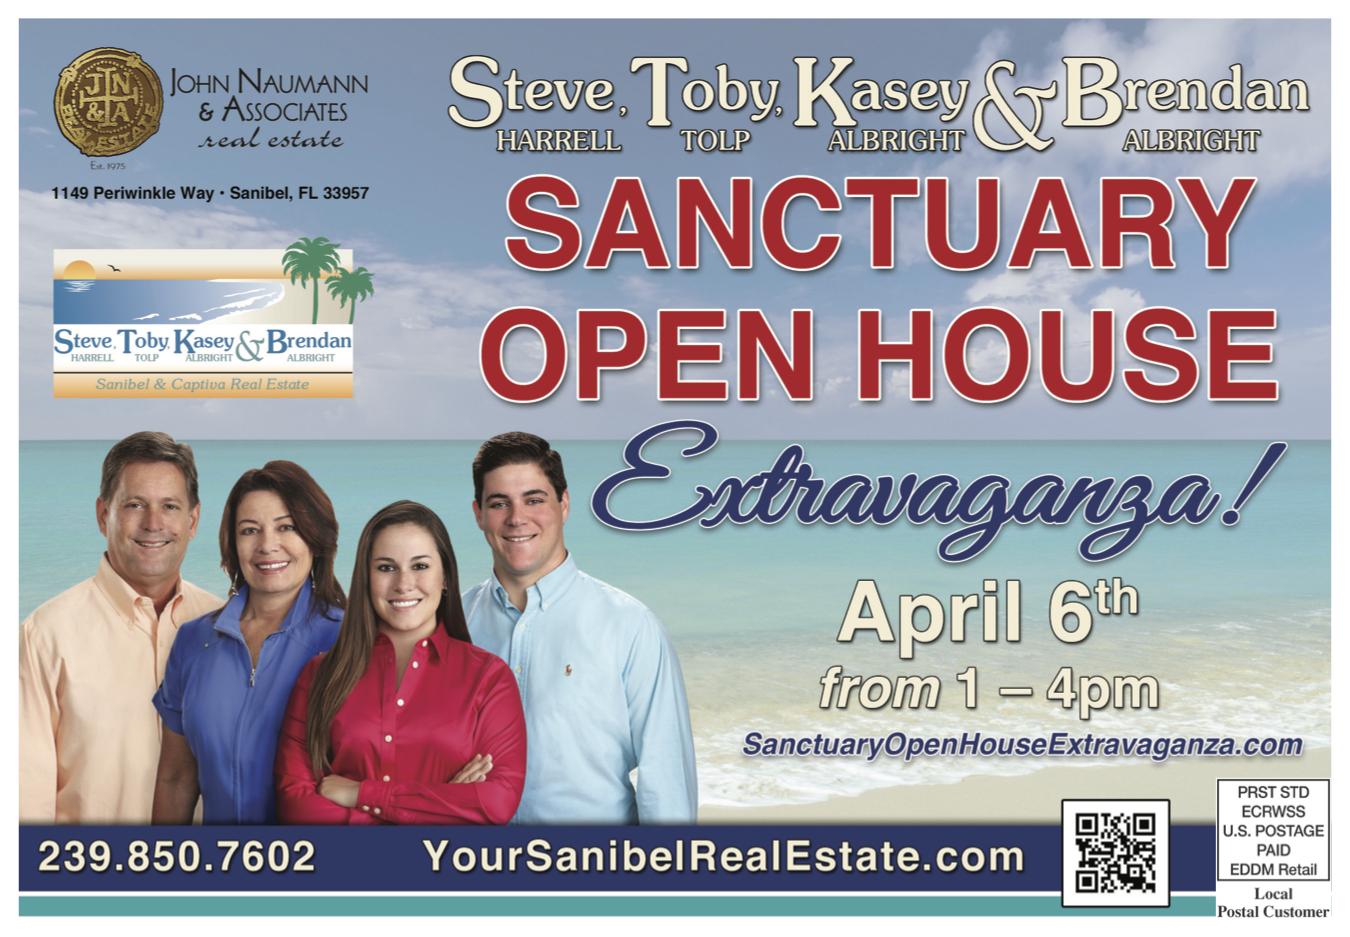 Sanctuary Open House Extravaganza